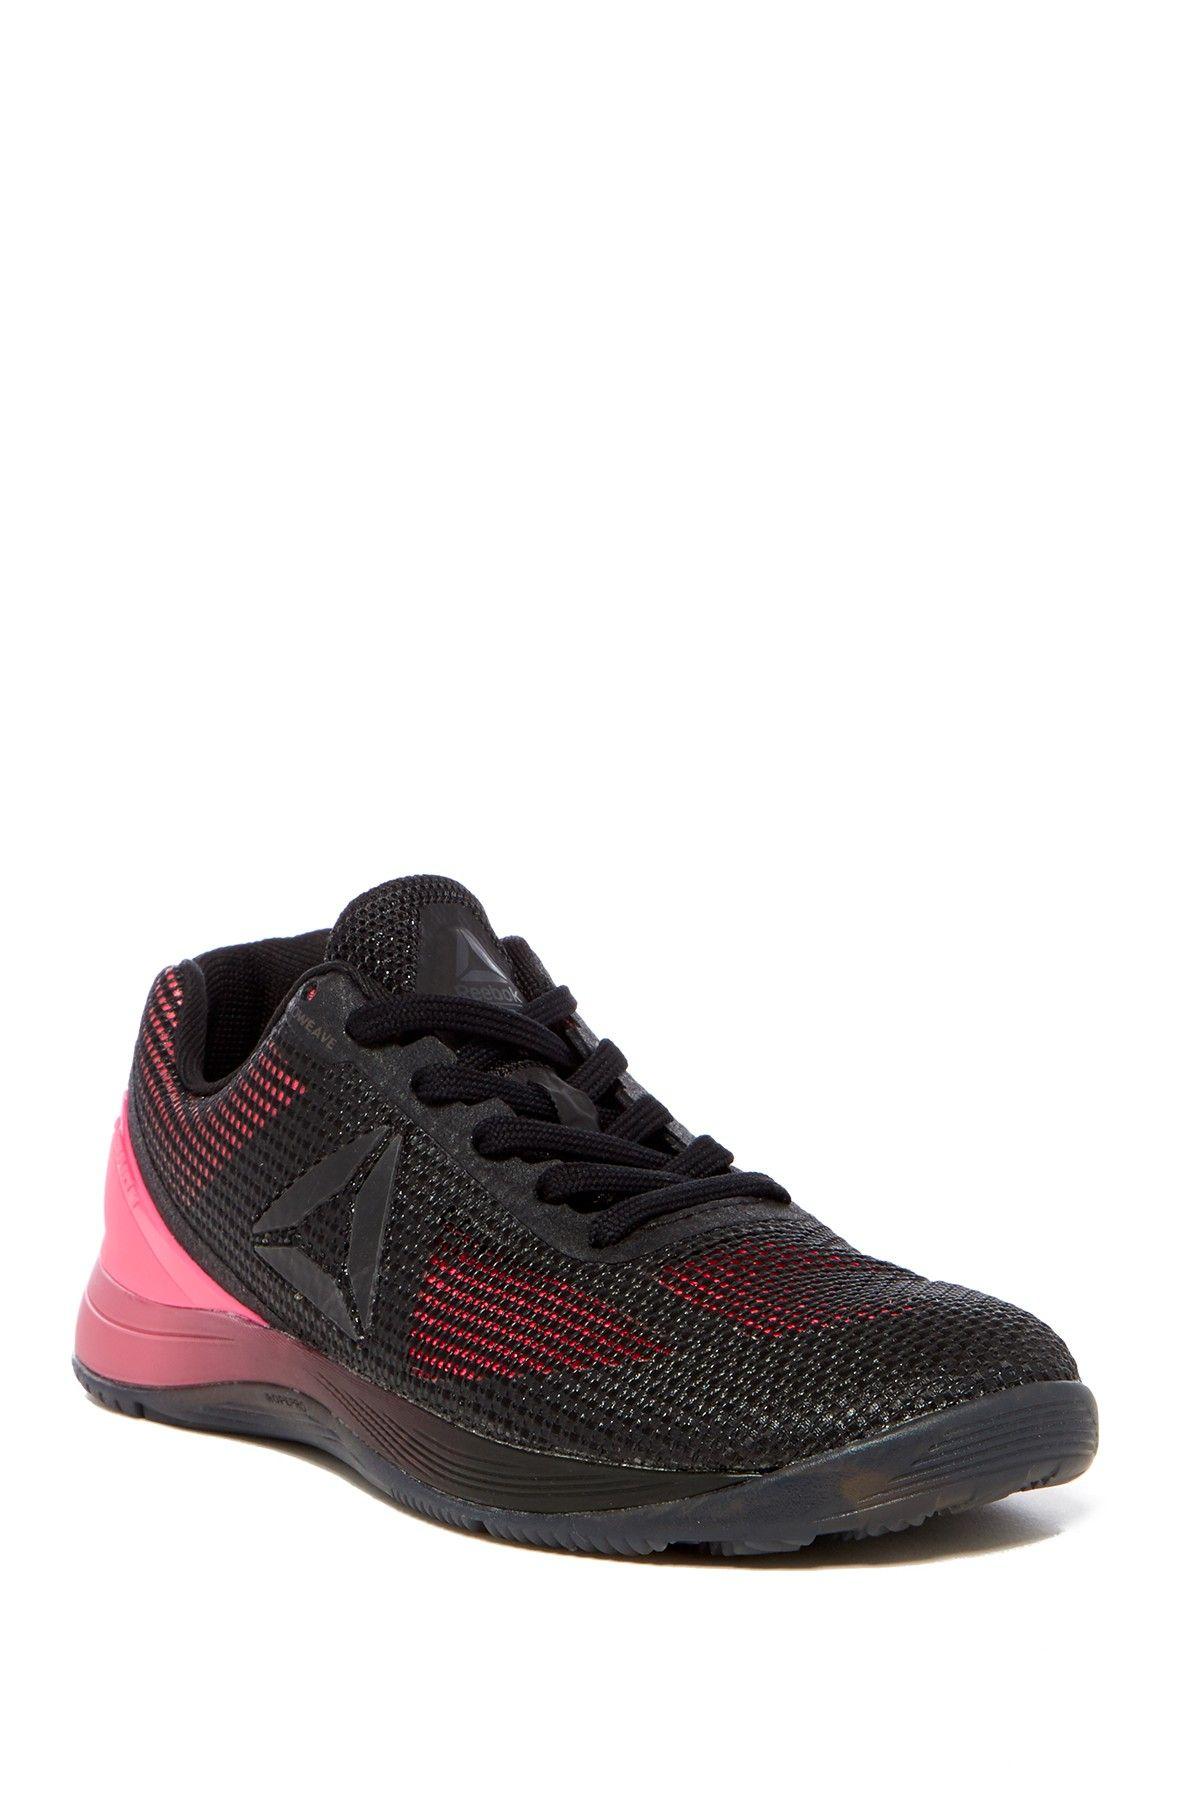 Crossfit Nano 7.0 Athletic Sneaker | Reebok crossfit nano